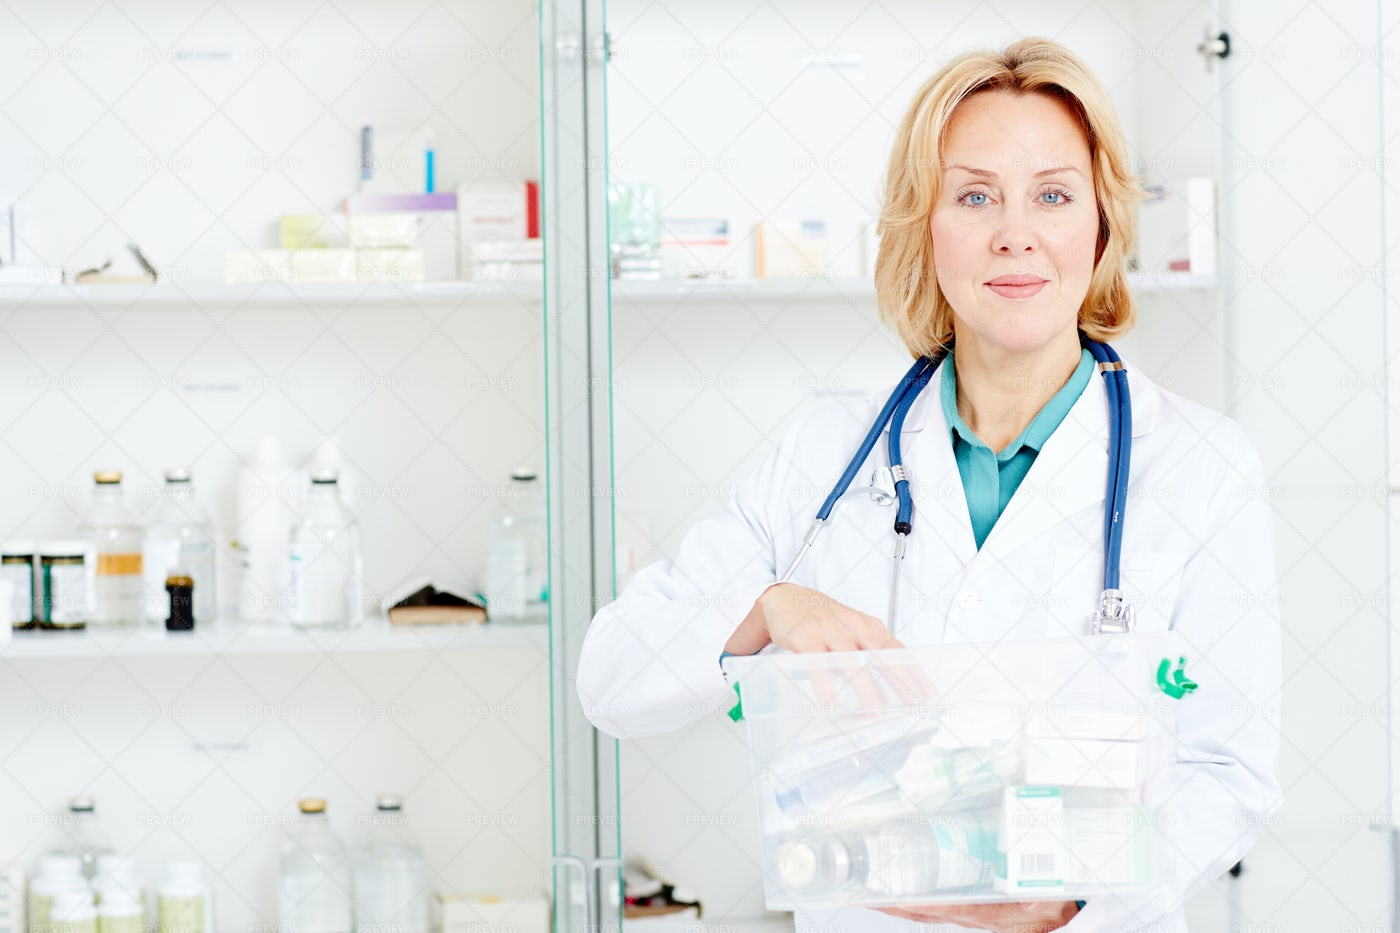 Pharmacist At Work: Stock Photos